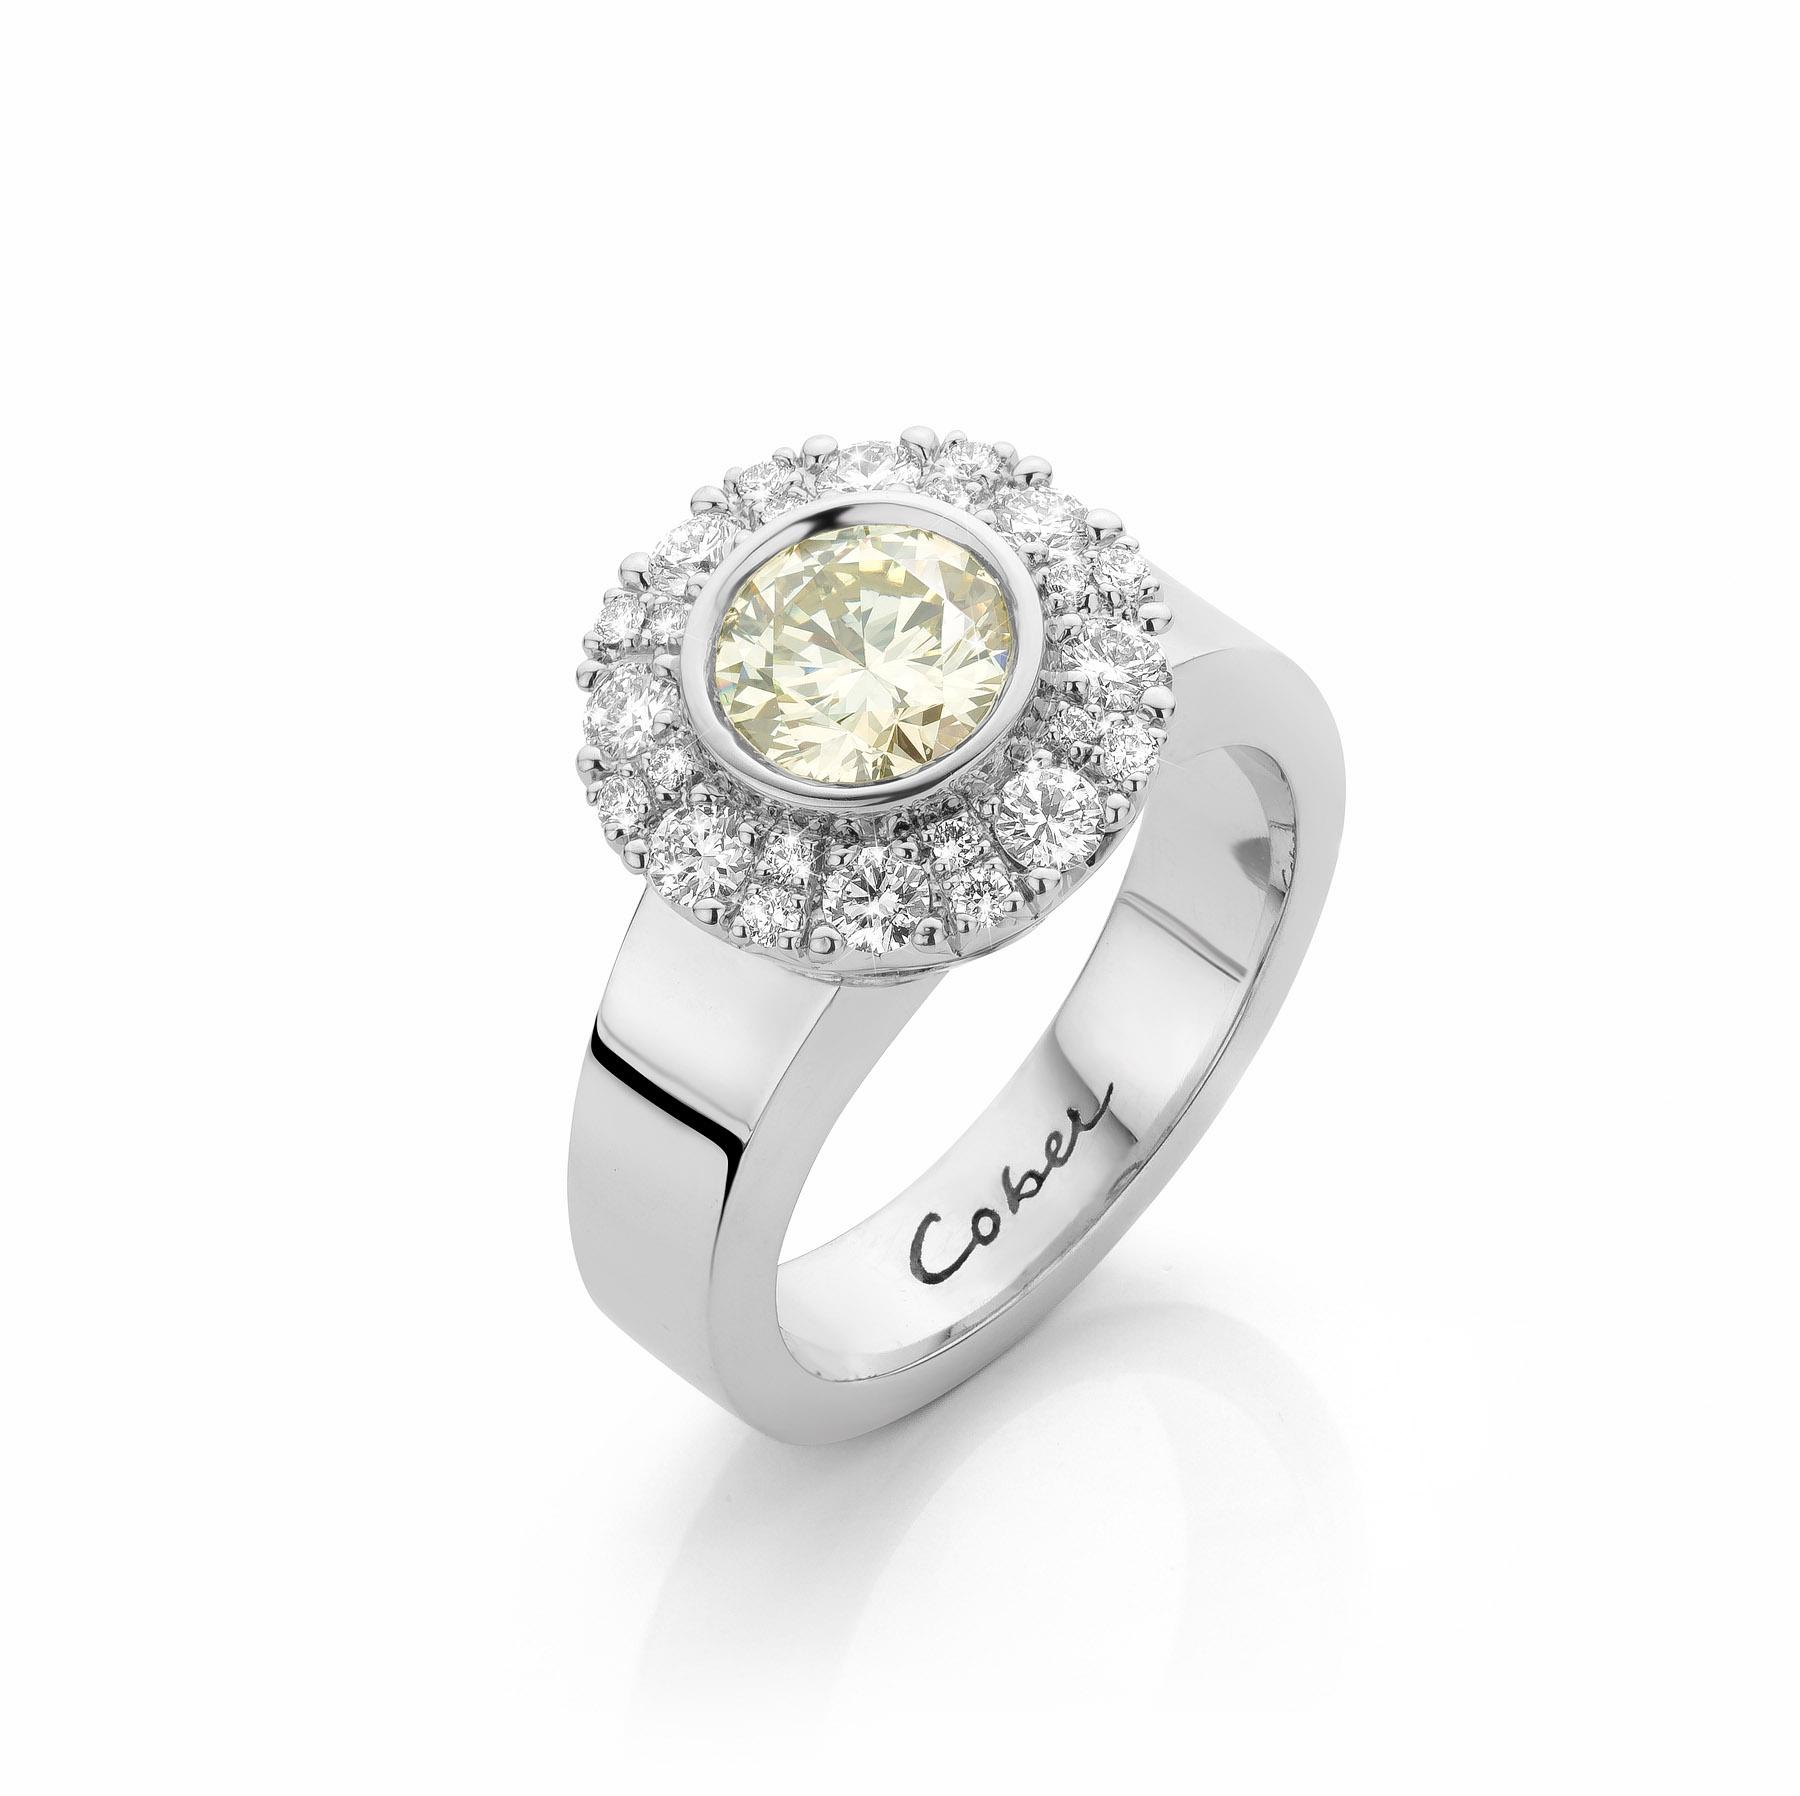 Groene diamant in 18 karaat witgouden ring